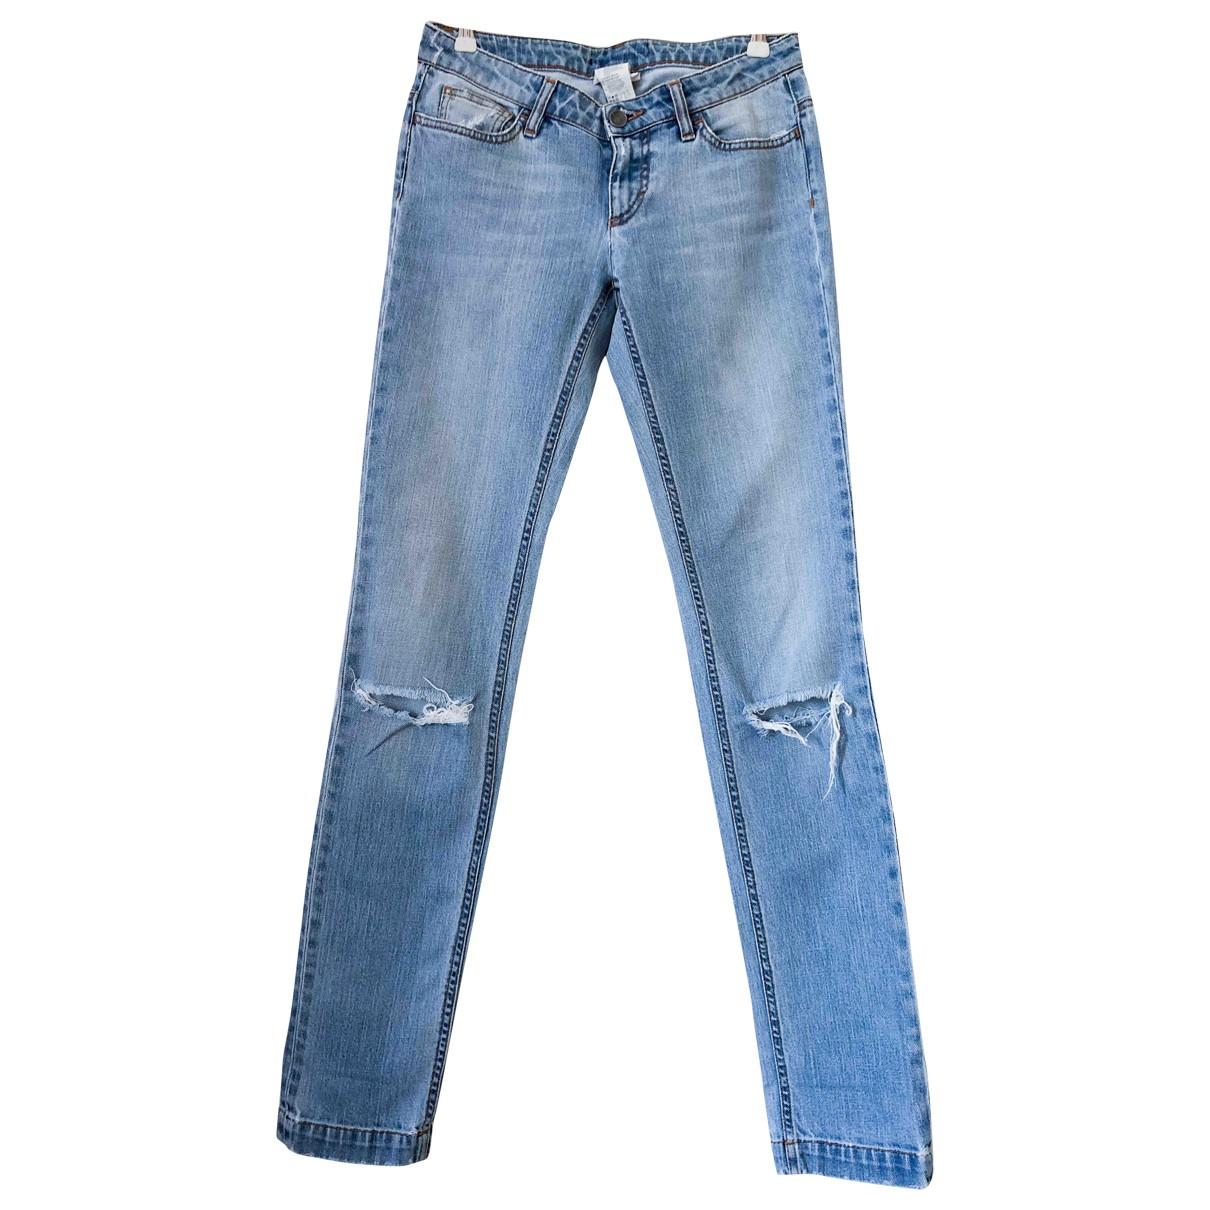 Dolce & Gabbana \N Blue Cotton - elasthane Jeans for Women 26 US